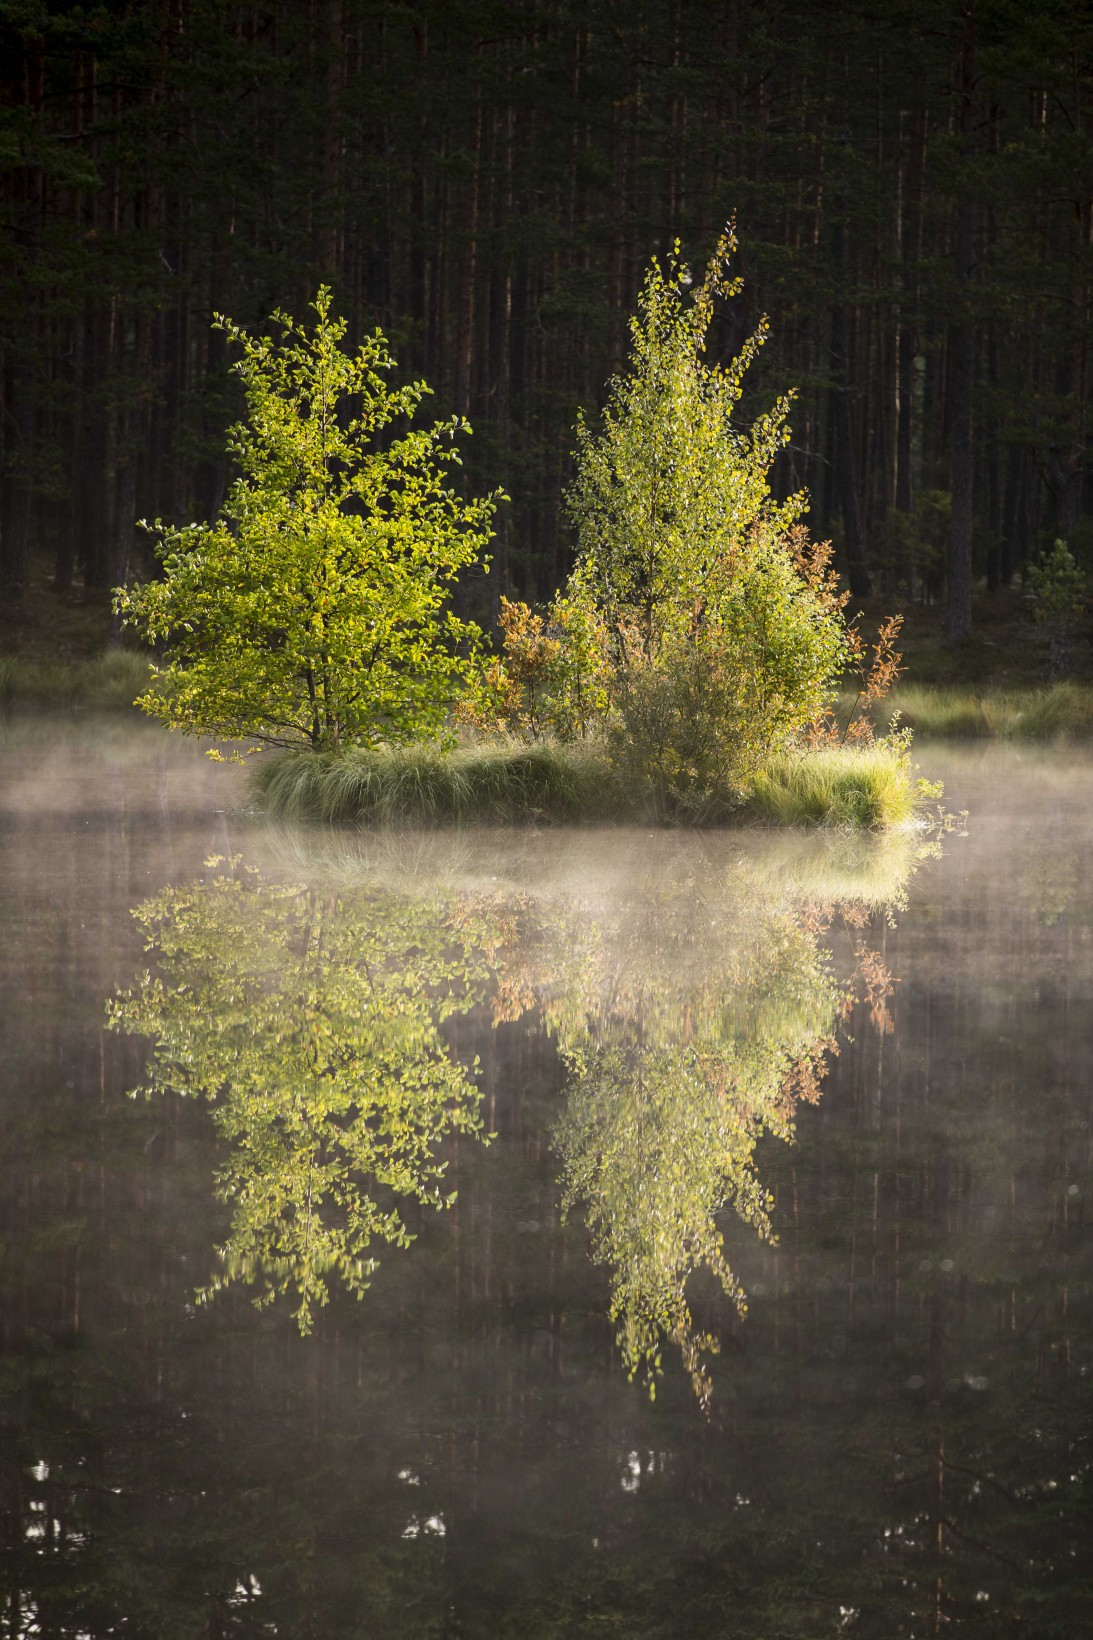 JAN_1765_JesperAnderssonPhotography